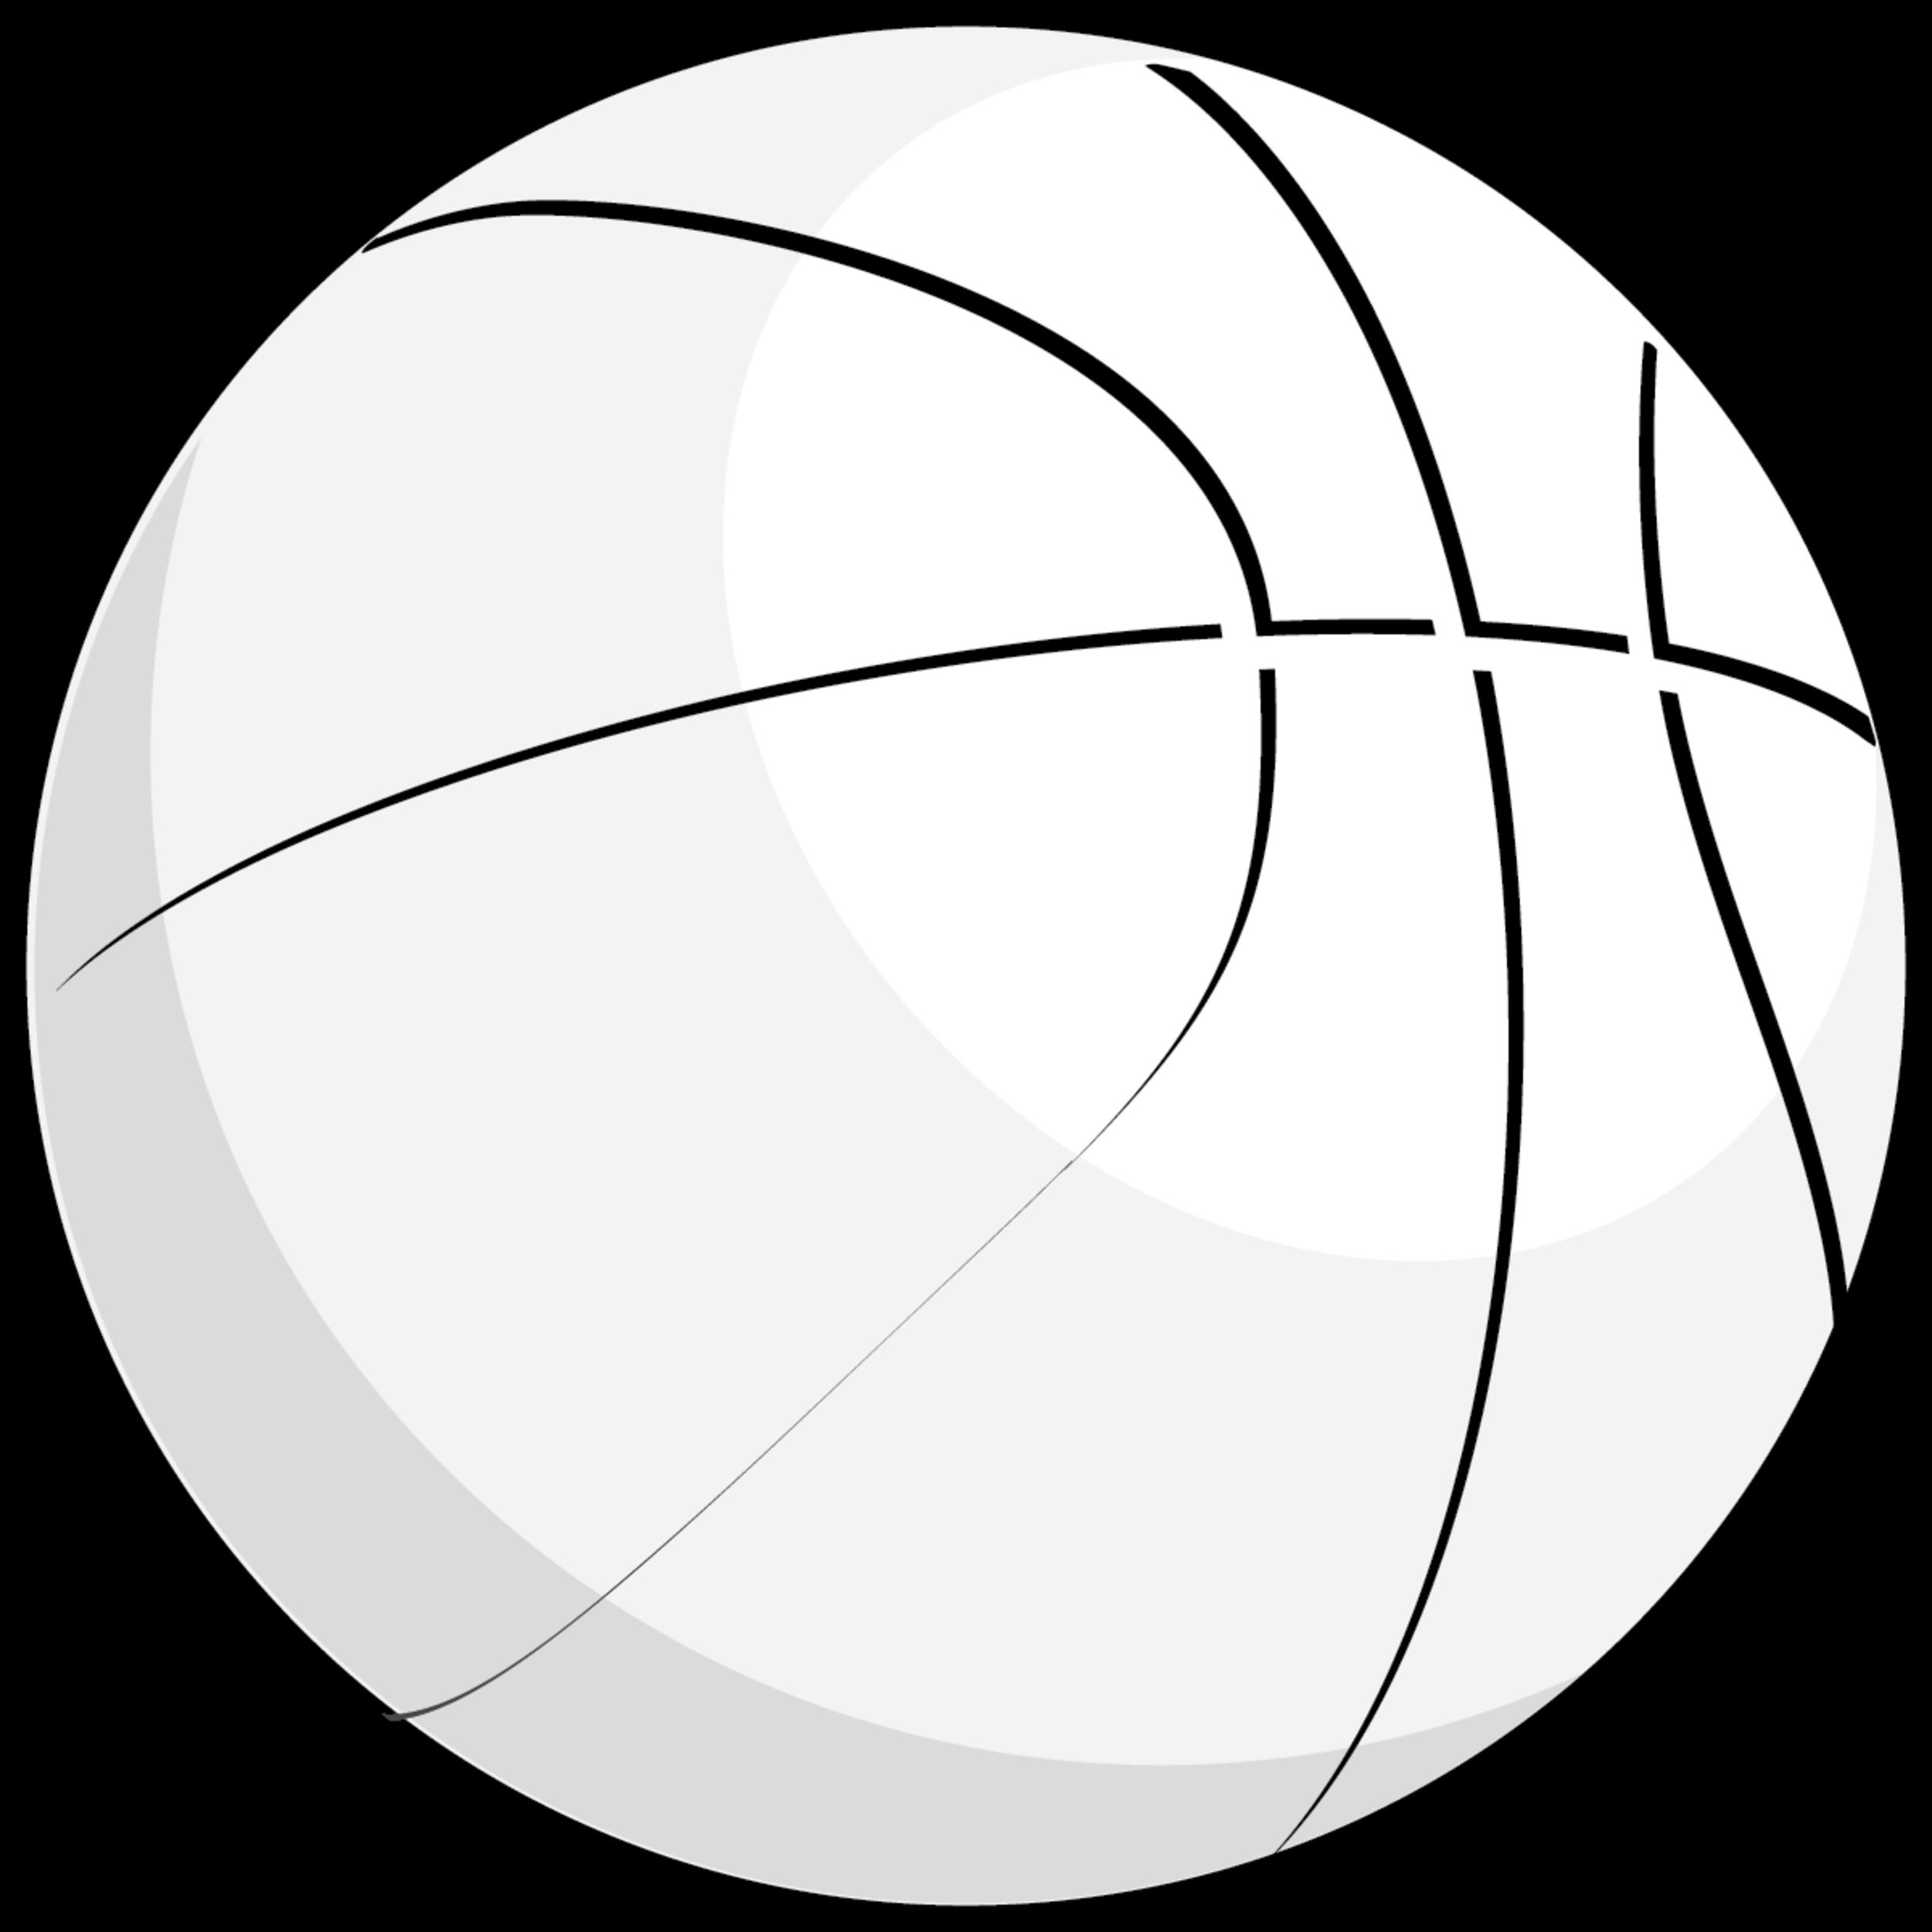 Playing basketball image jokingart. Igloo clipart sketch